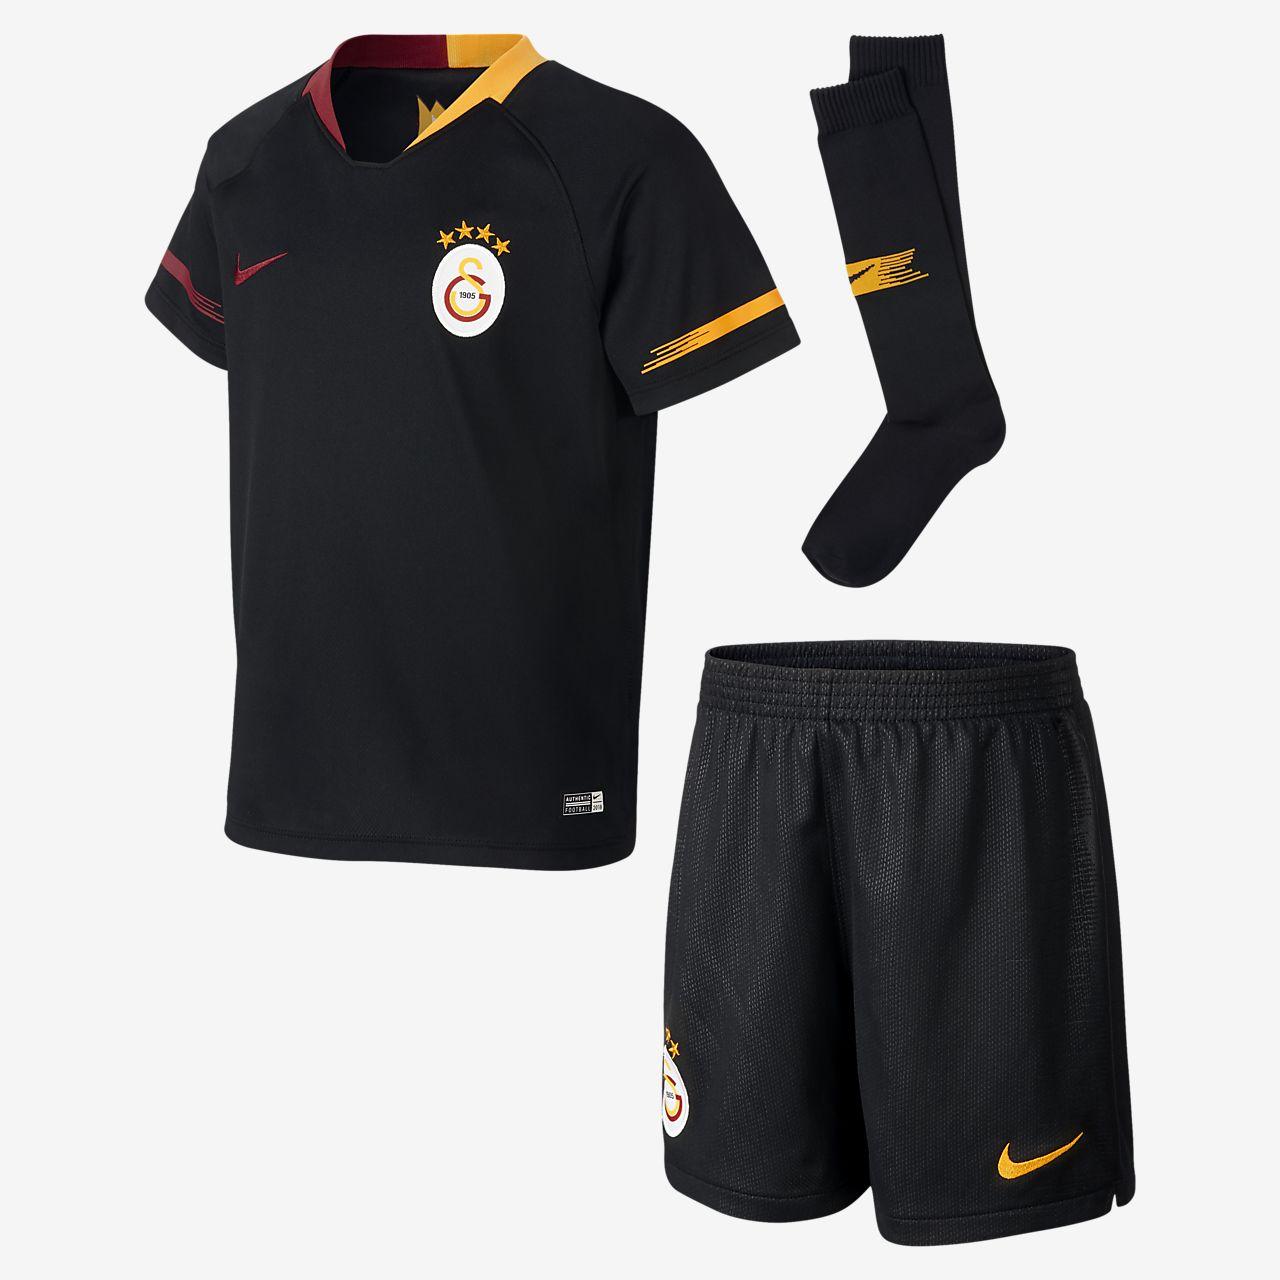 2018/19 Galatasaray S.K. Stadium Away Equipació de futbol - Nen/a petit/a